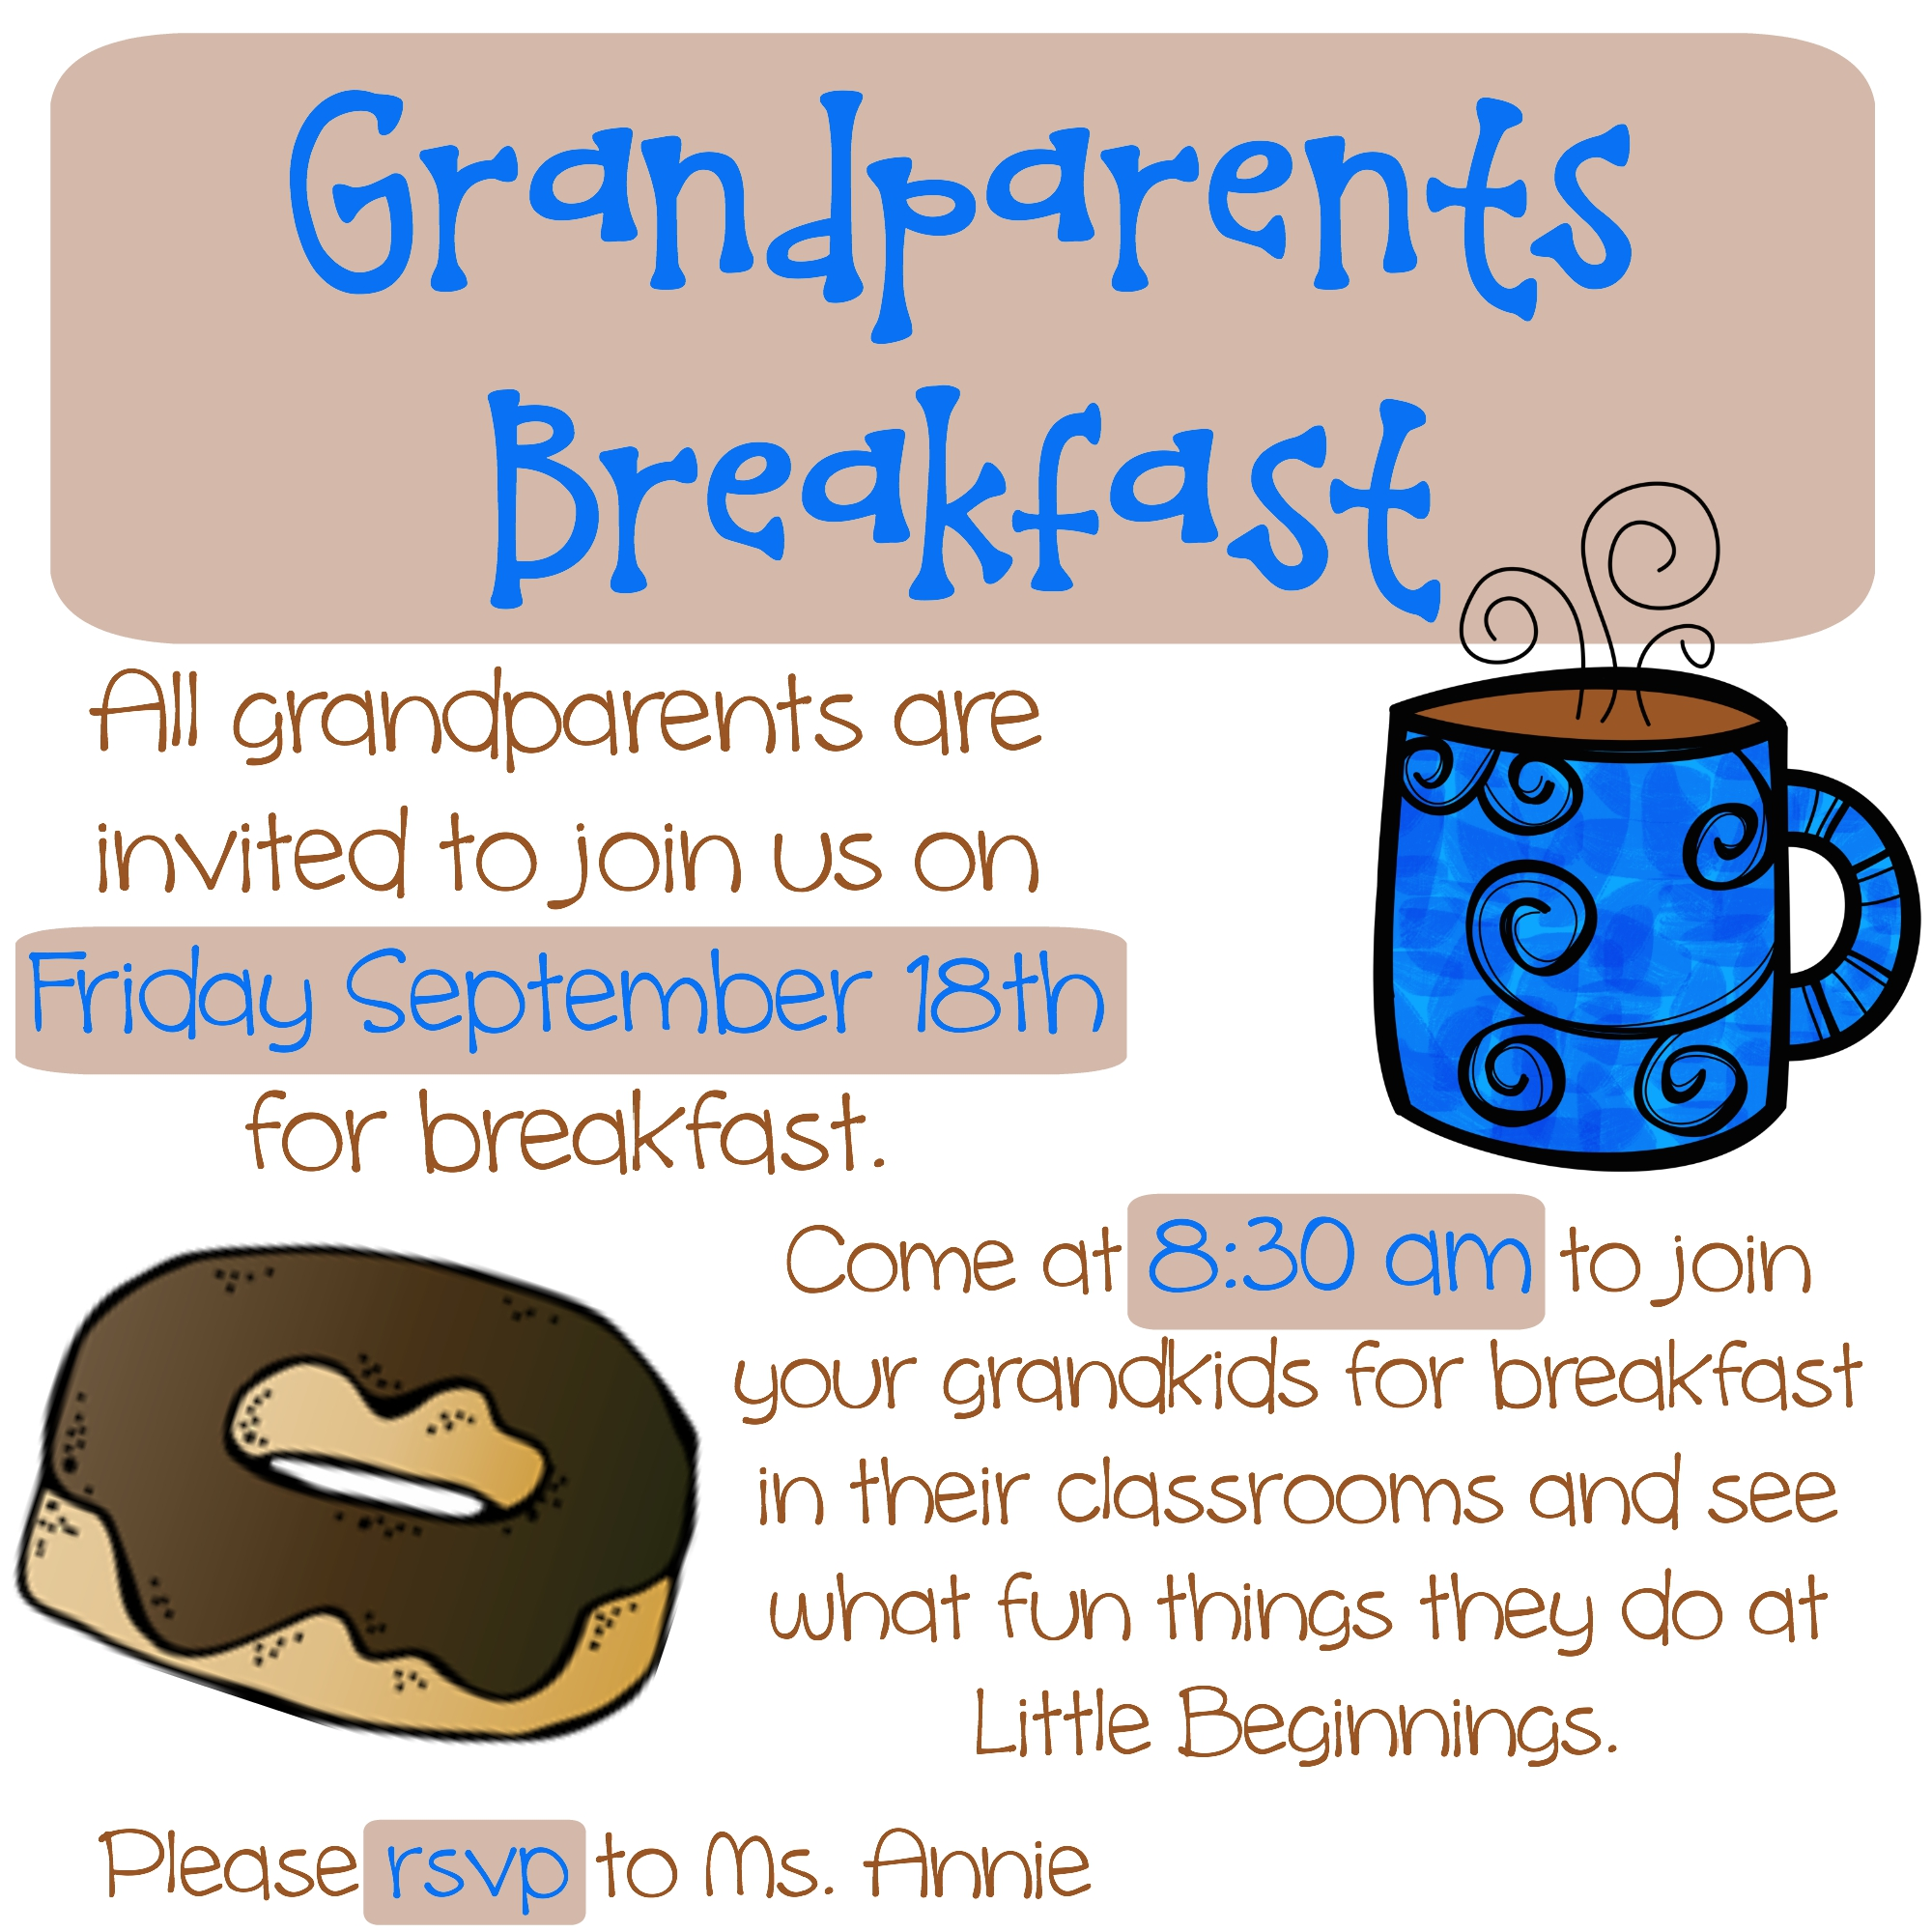 grandparents breakfast clipart - photo #16